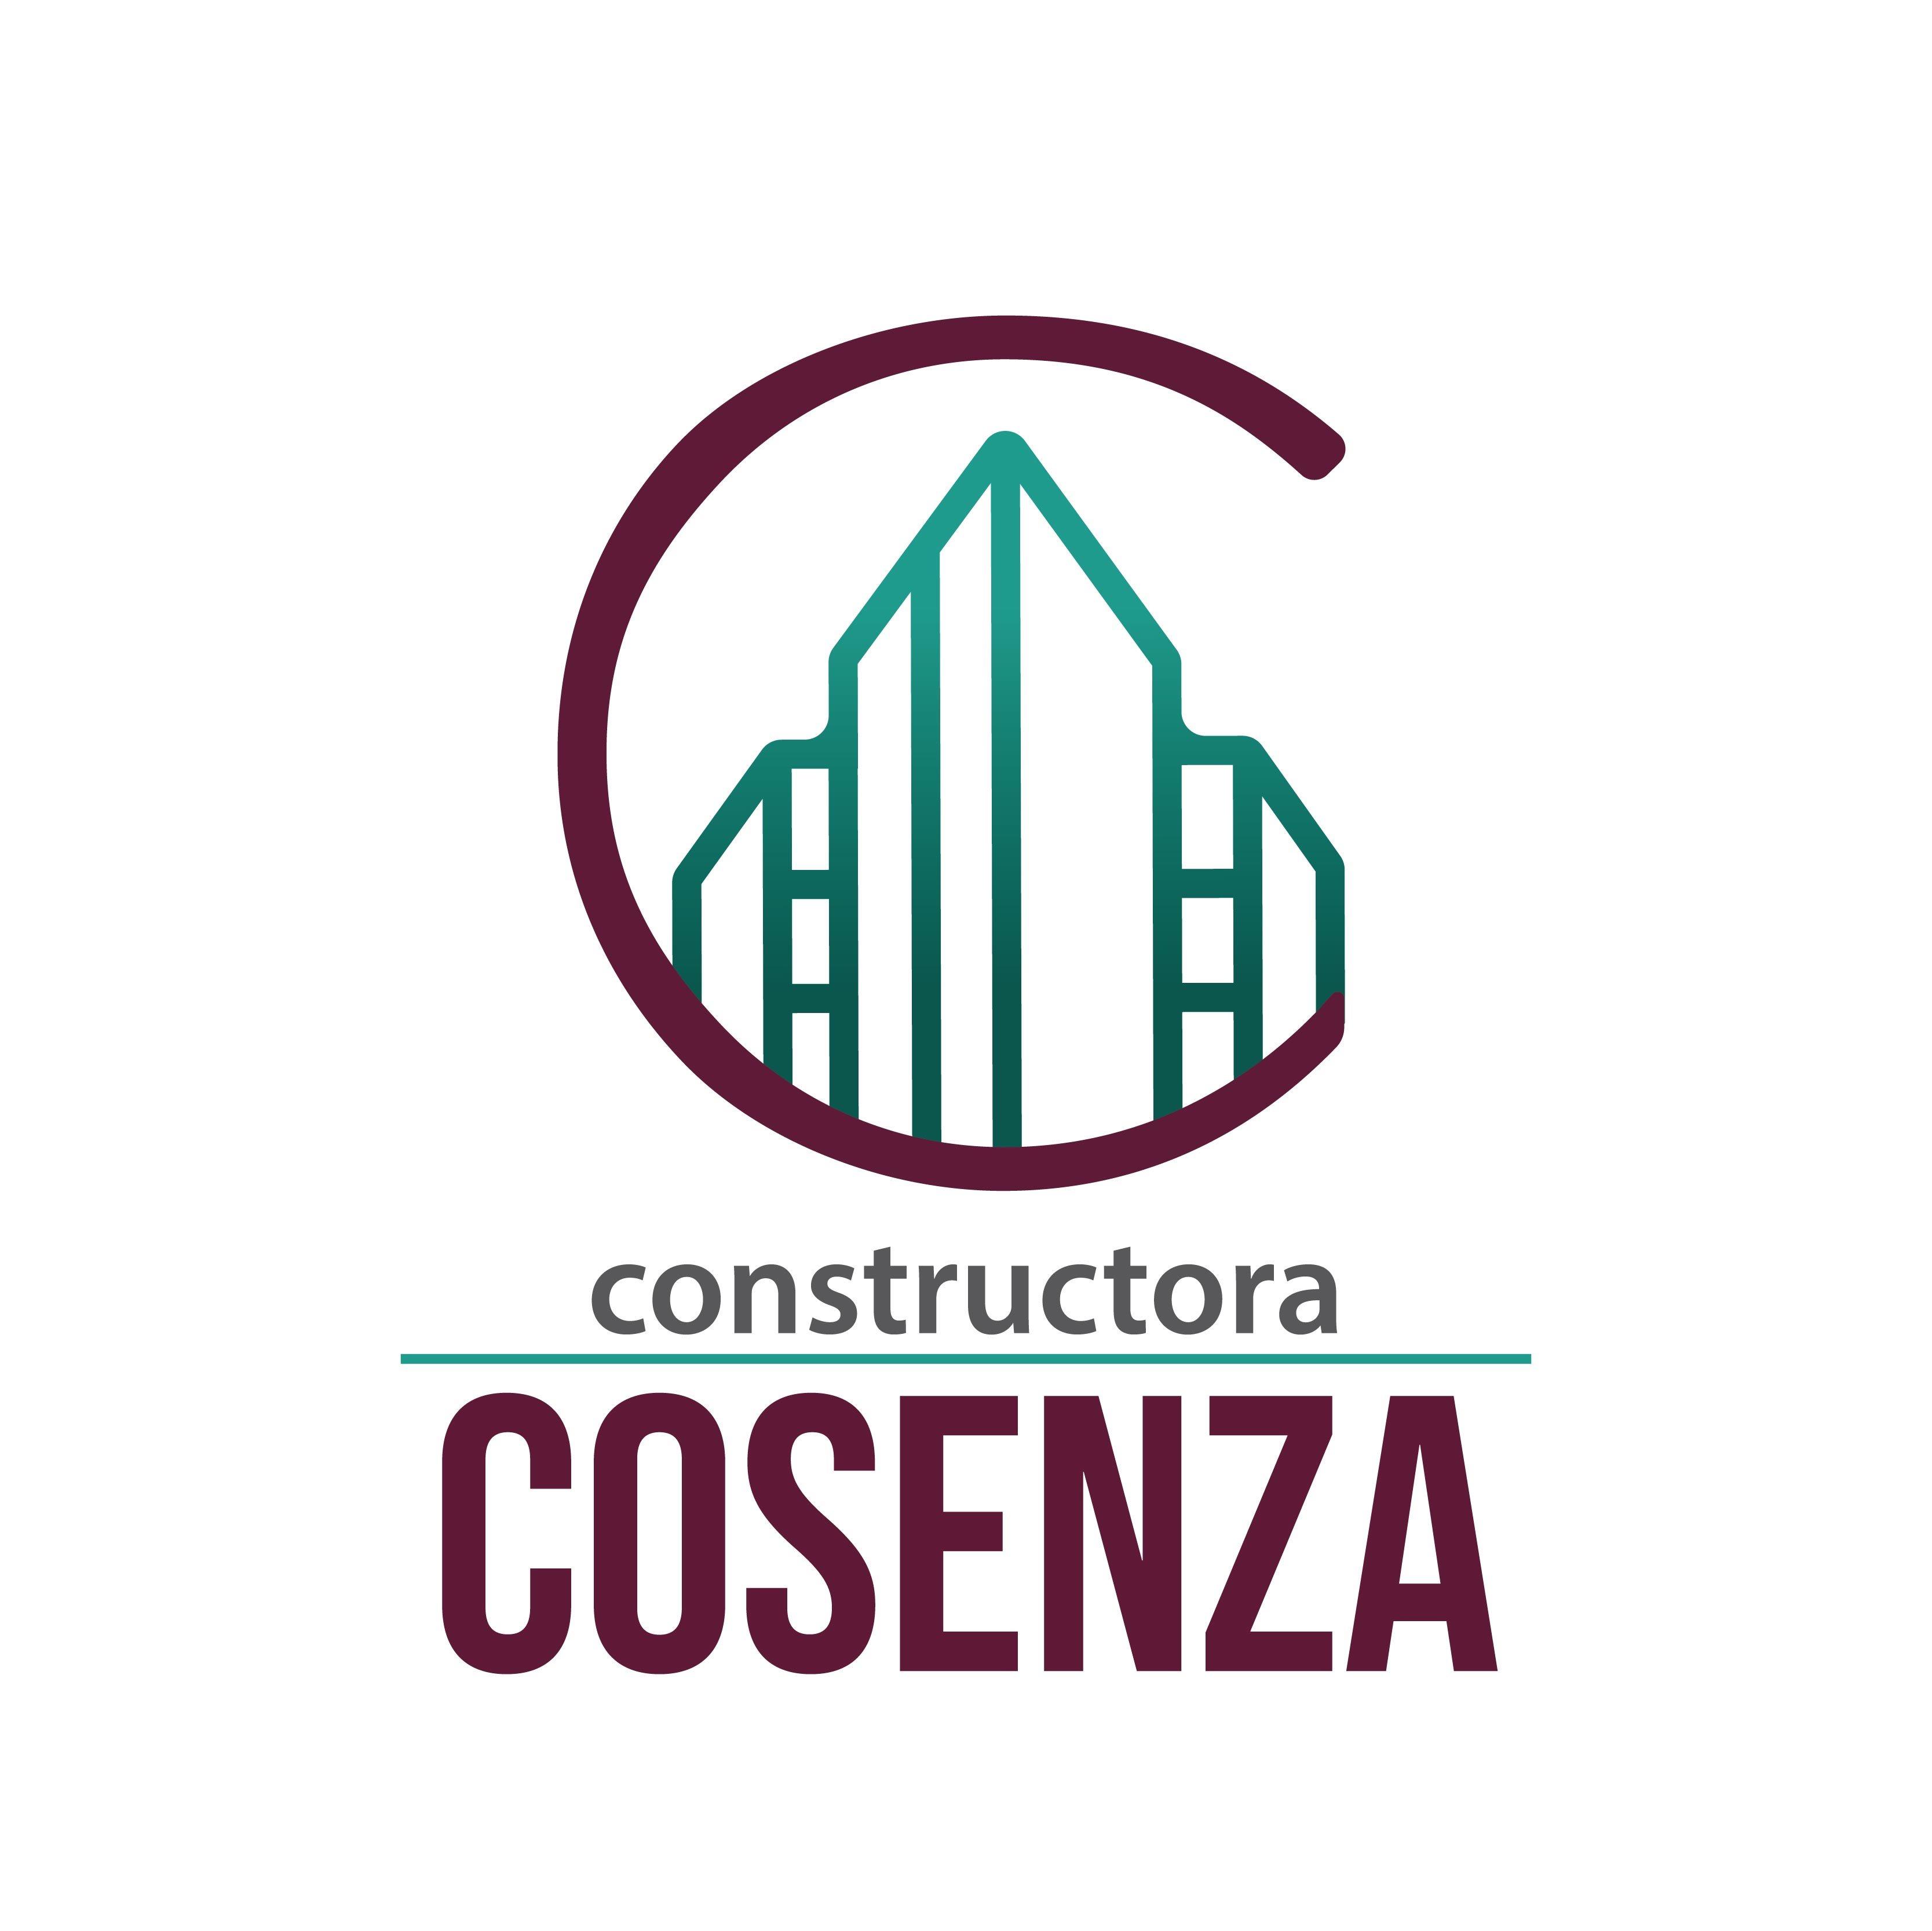 Constructora Cosenza